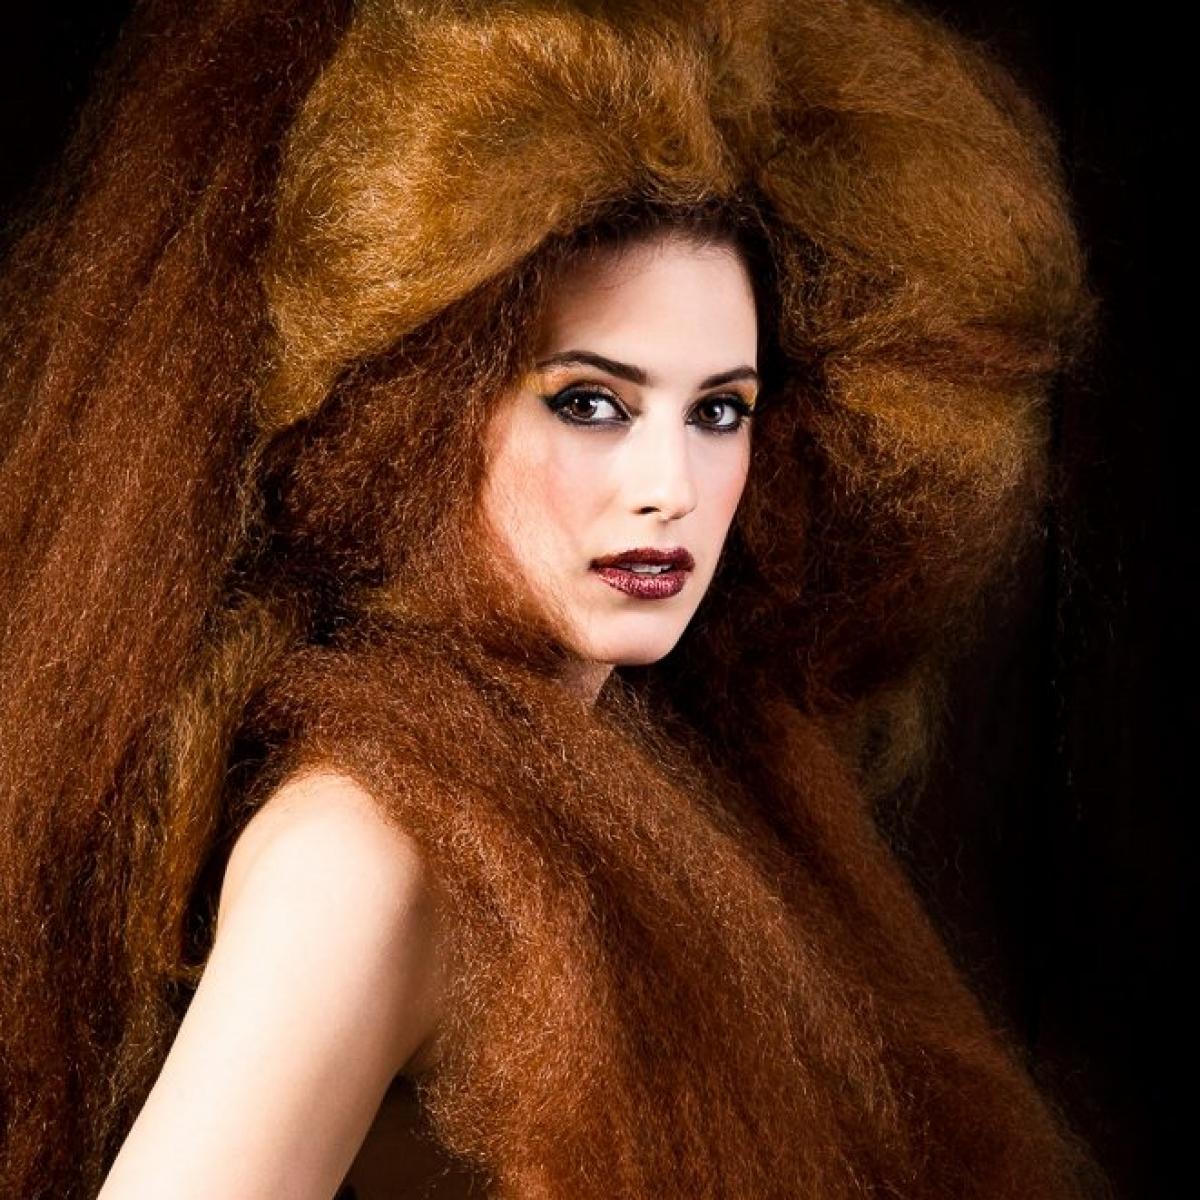 portrait, photographe, photographie, marwan moussa, coiffeur, coiffure, mariocoiffe, mario coiffe, lightroom, frank provost, studio